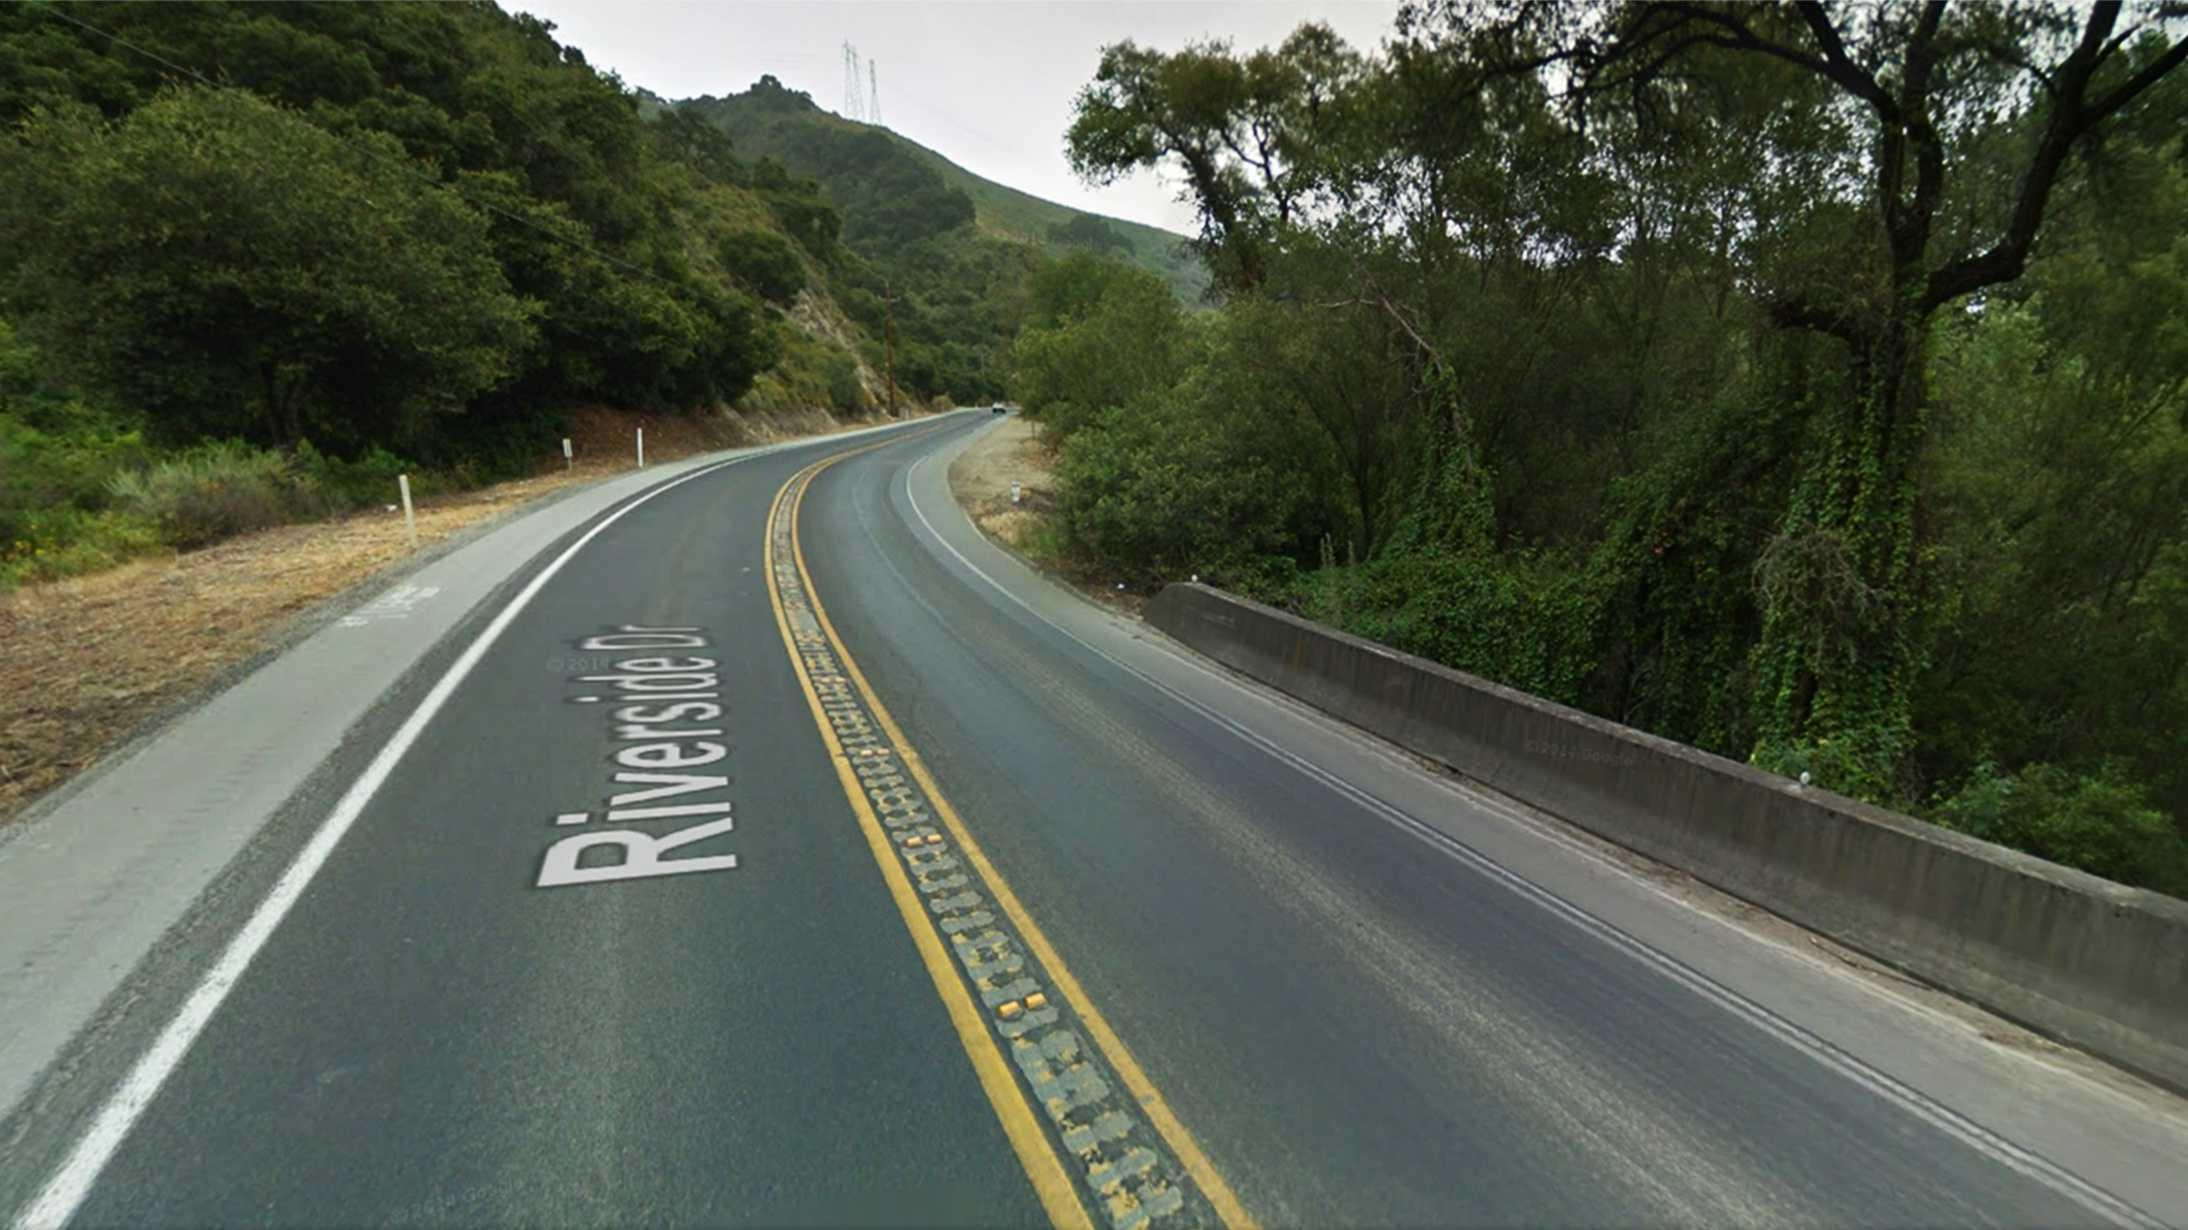 Highway 129 nearOld Chittenden Road